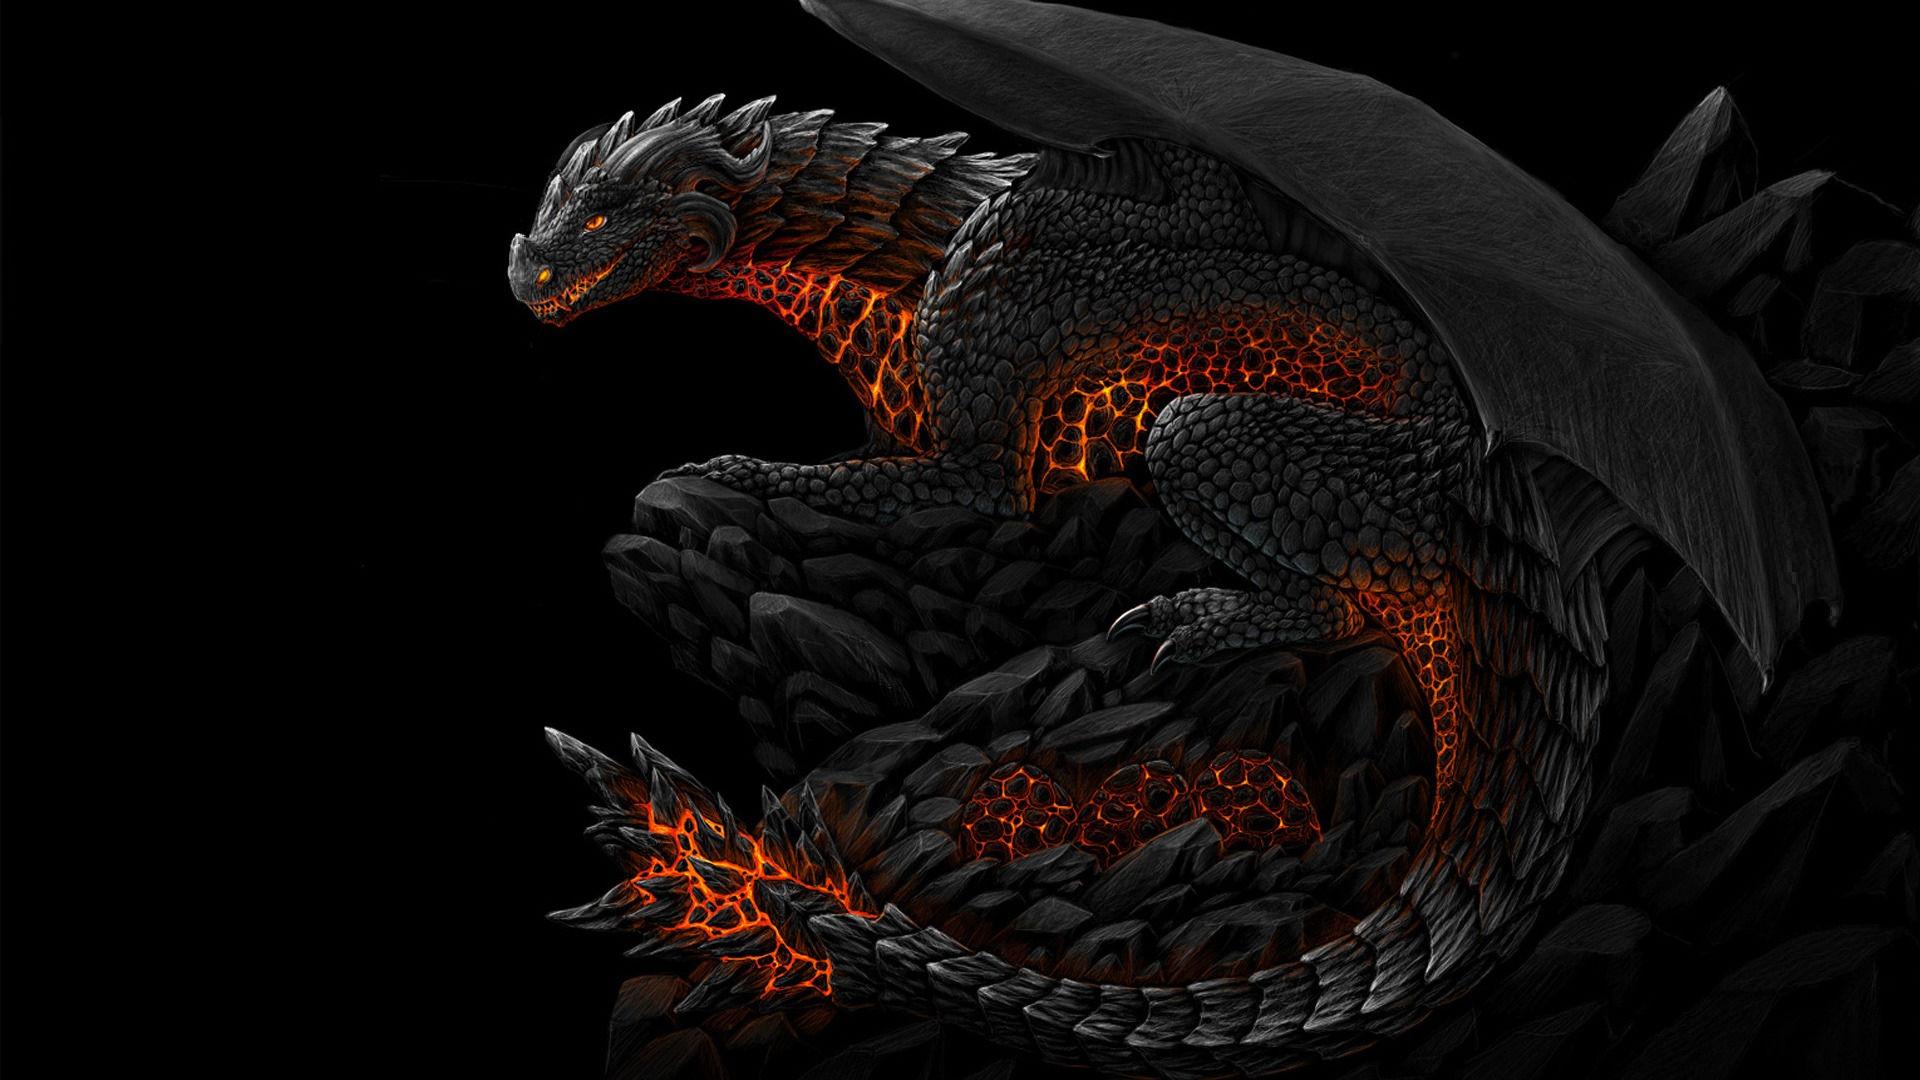 Dragon Wallpapers Best Wallpapers 1920x1080